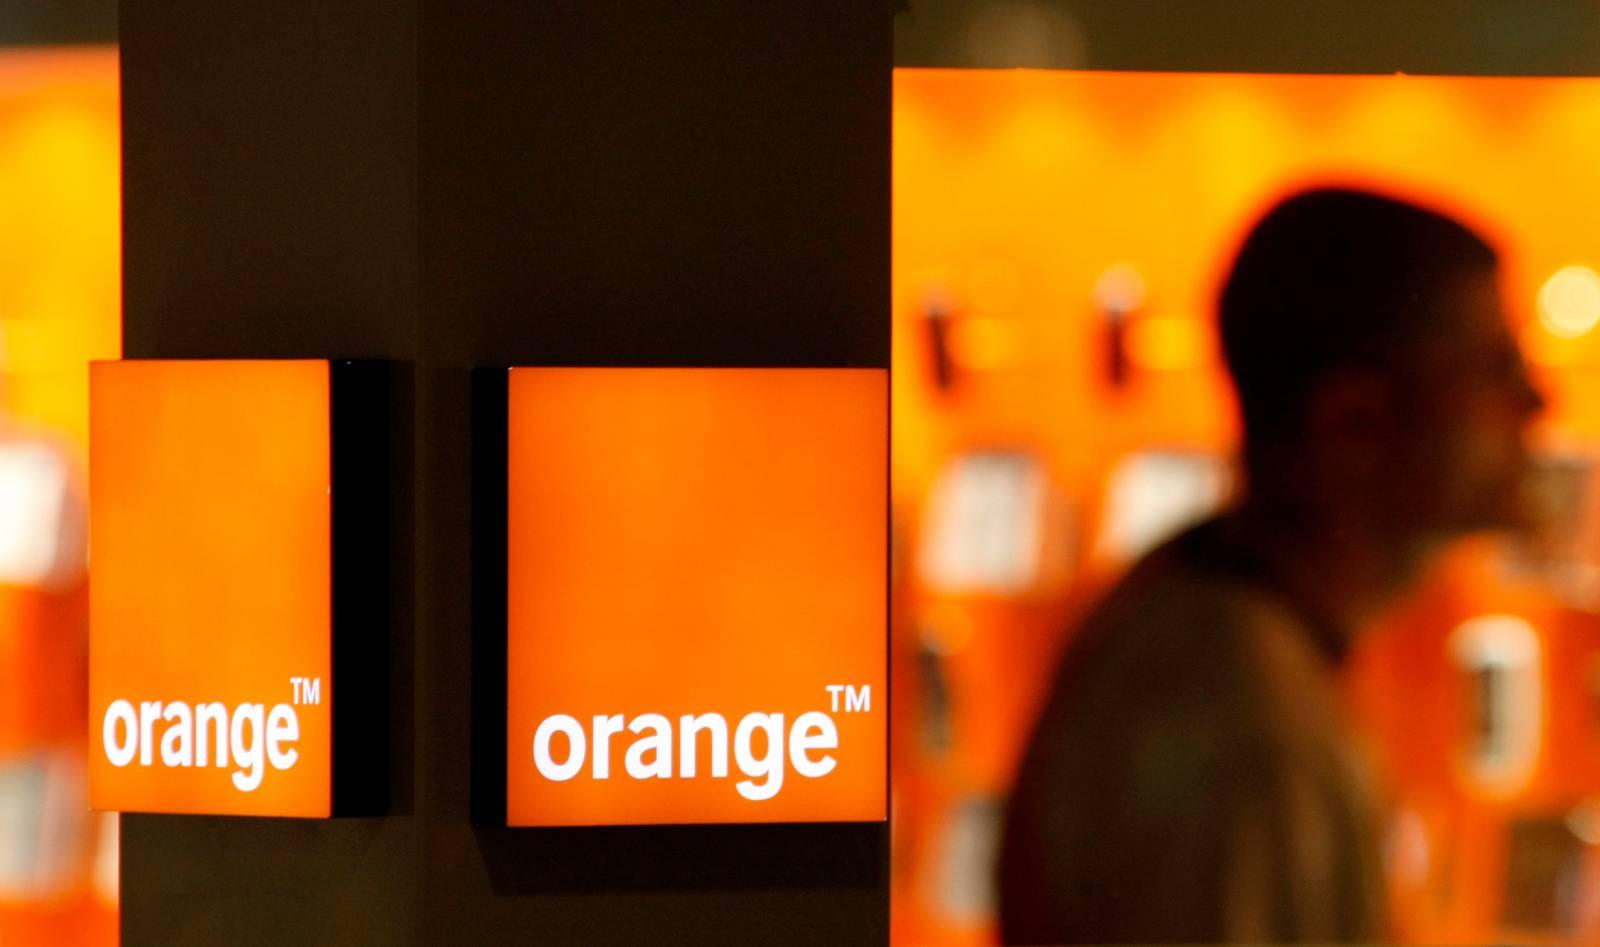 orange telefoane oferte speciale vara